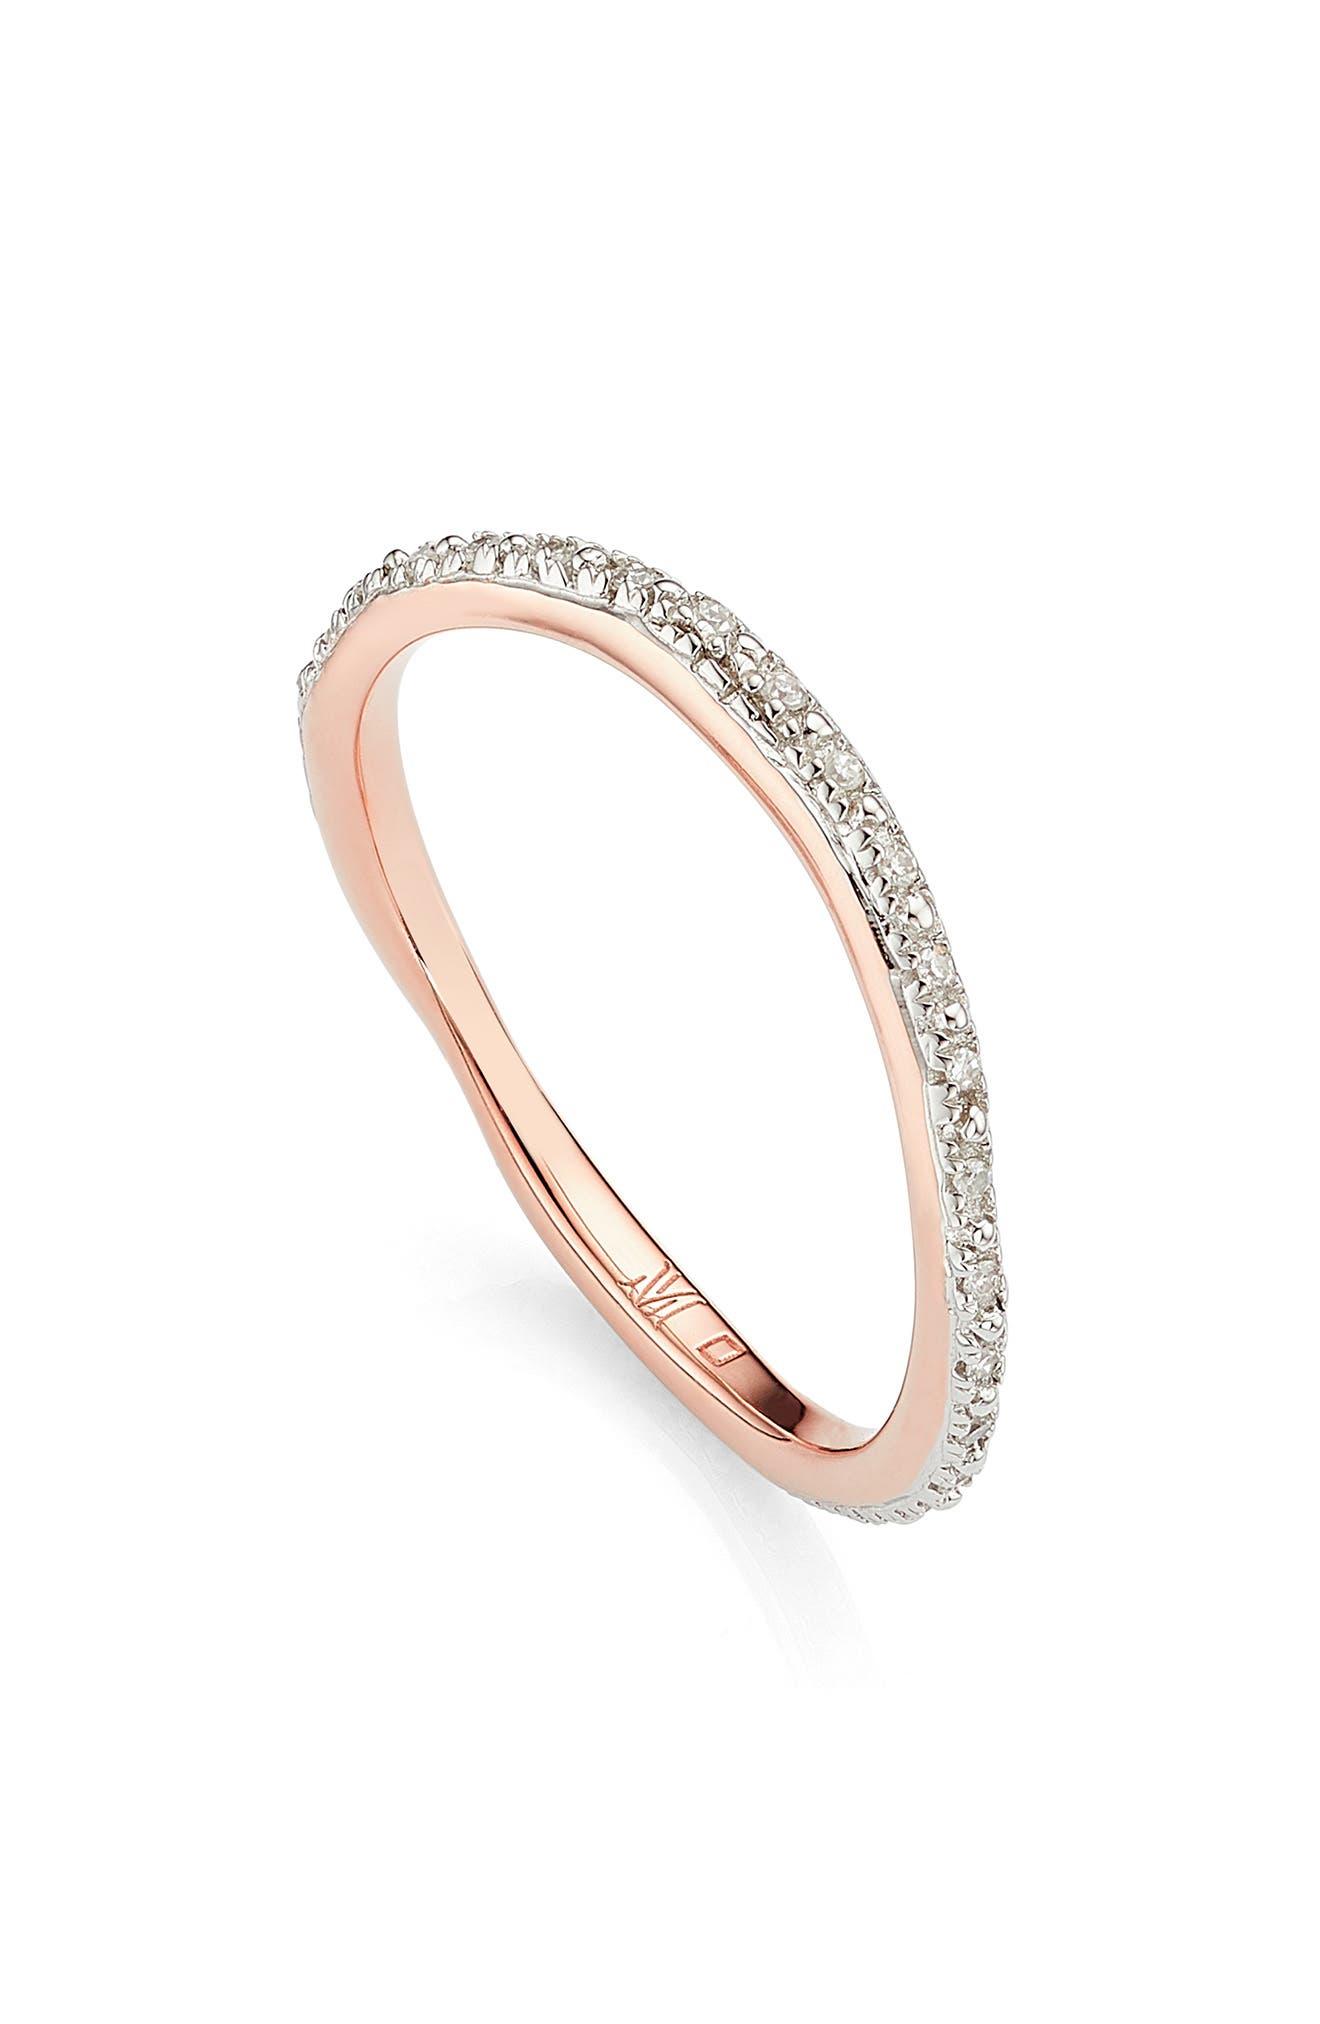 MONICA VINADER Riva Wave Diamond Eternity Ring, Main, color, ROSE GOLD/ DIAMOND